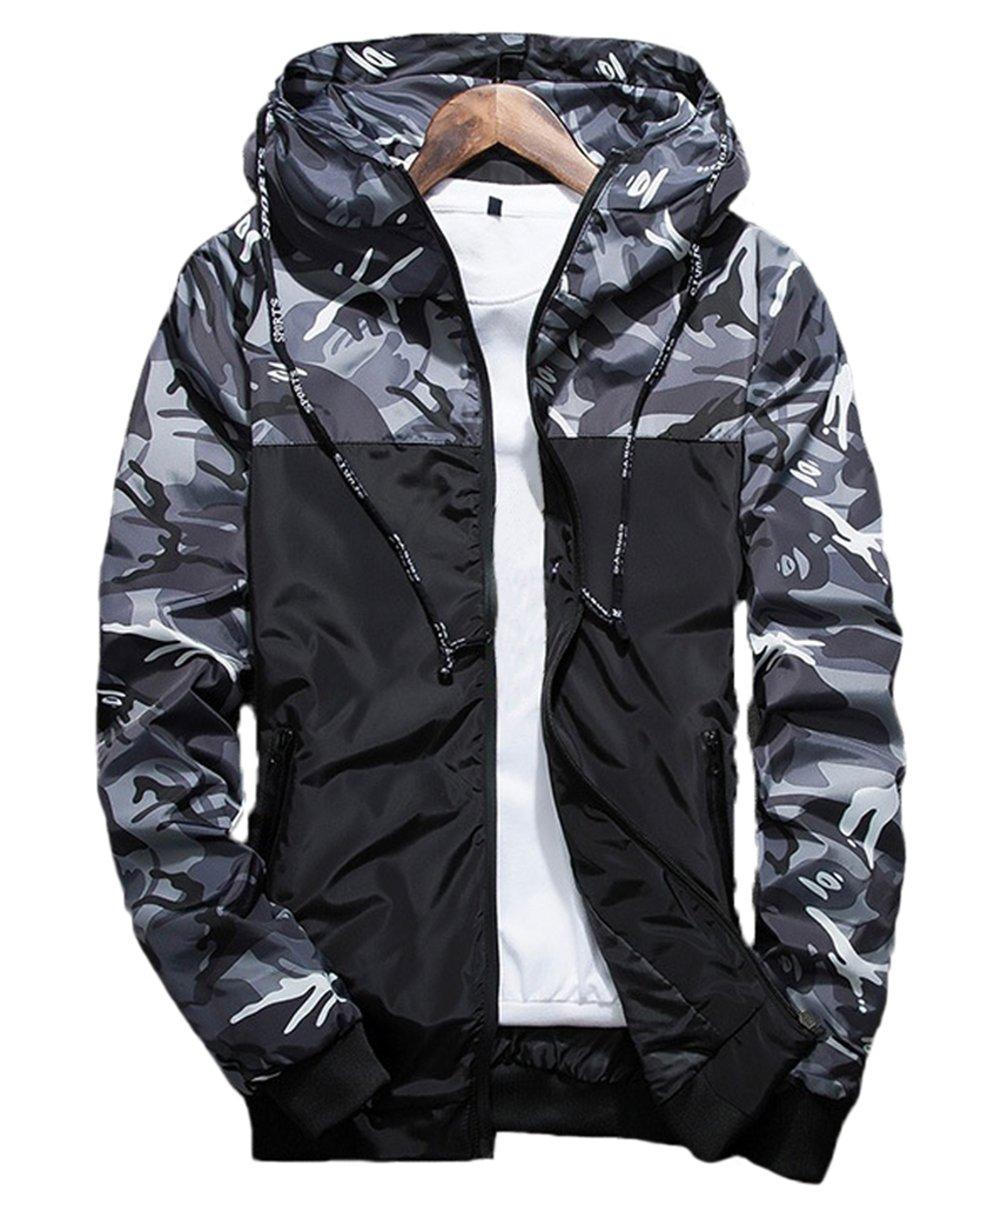 XARAZA Men's Long Sleeve Camo Hoodie Jacket Outwear Hooded Windbreaker (US-XL=Tag 3XL(Asian Size), Grey)